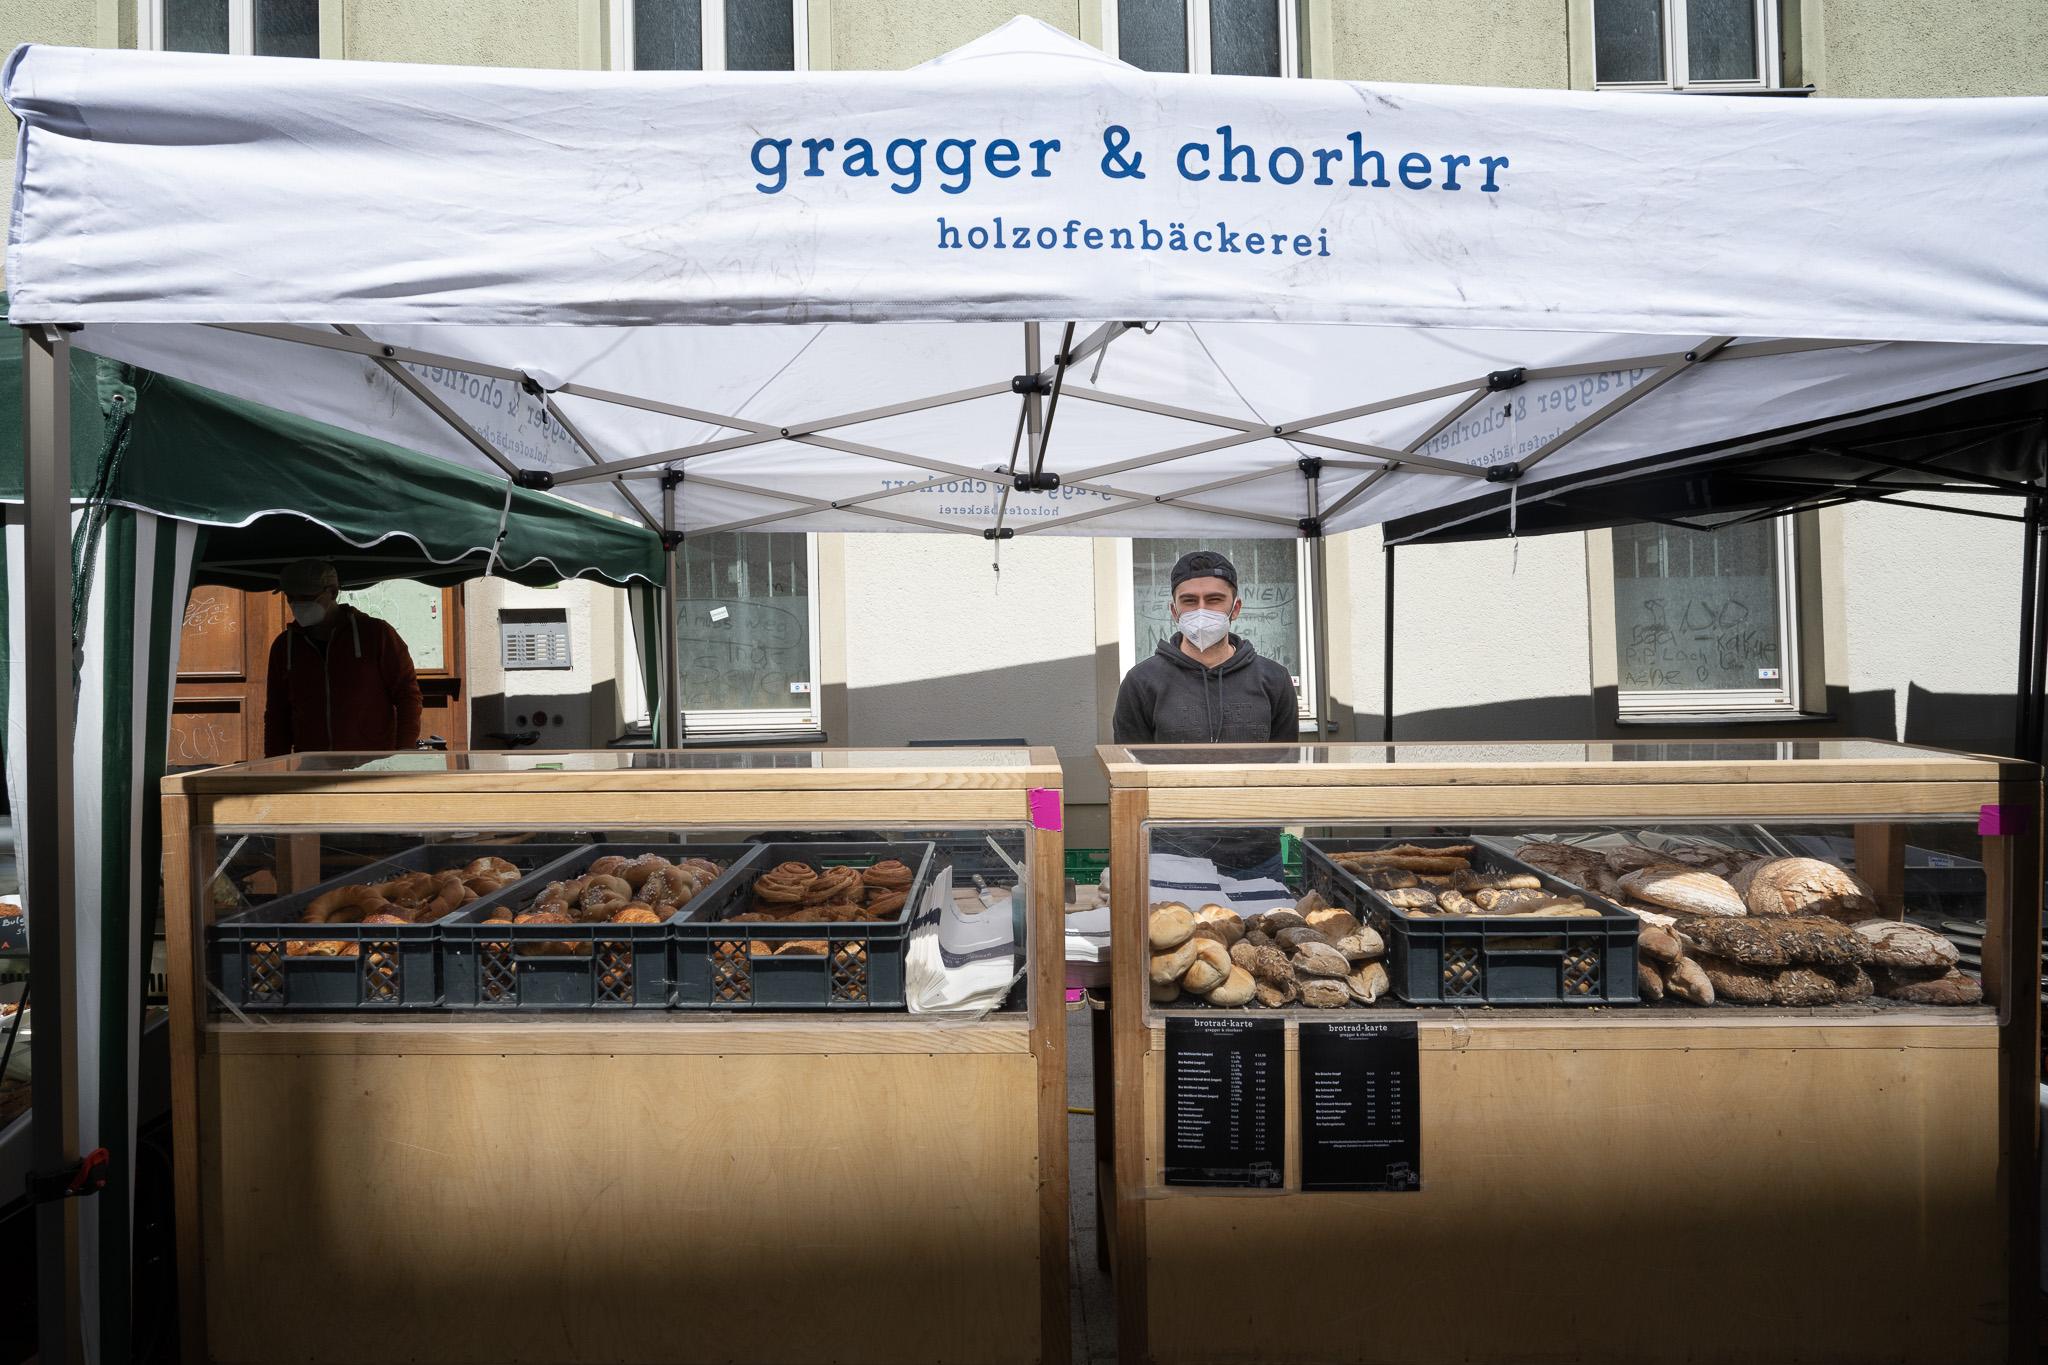 gragger & chorherr – ©Michaela Krauss-Boneau